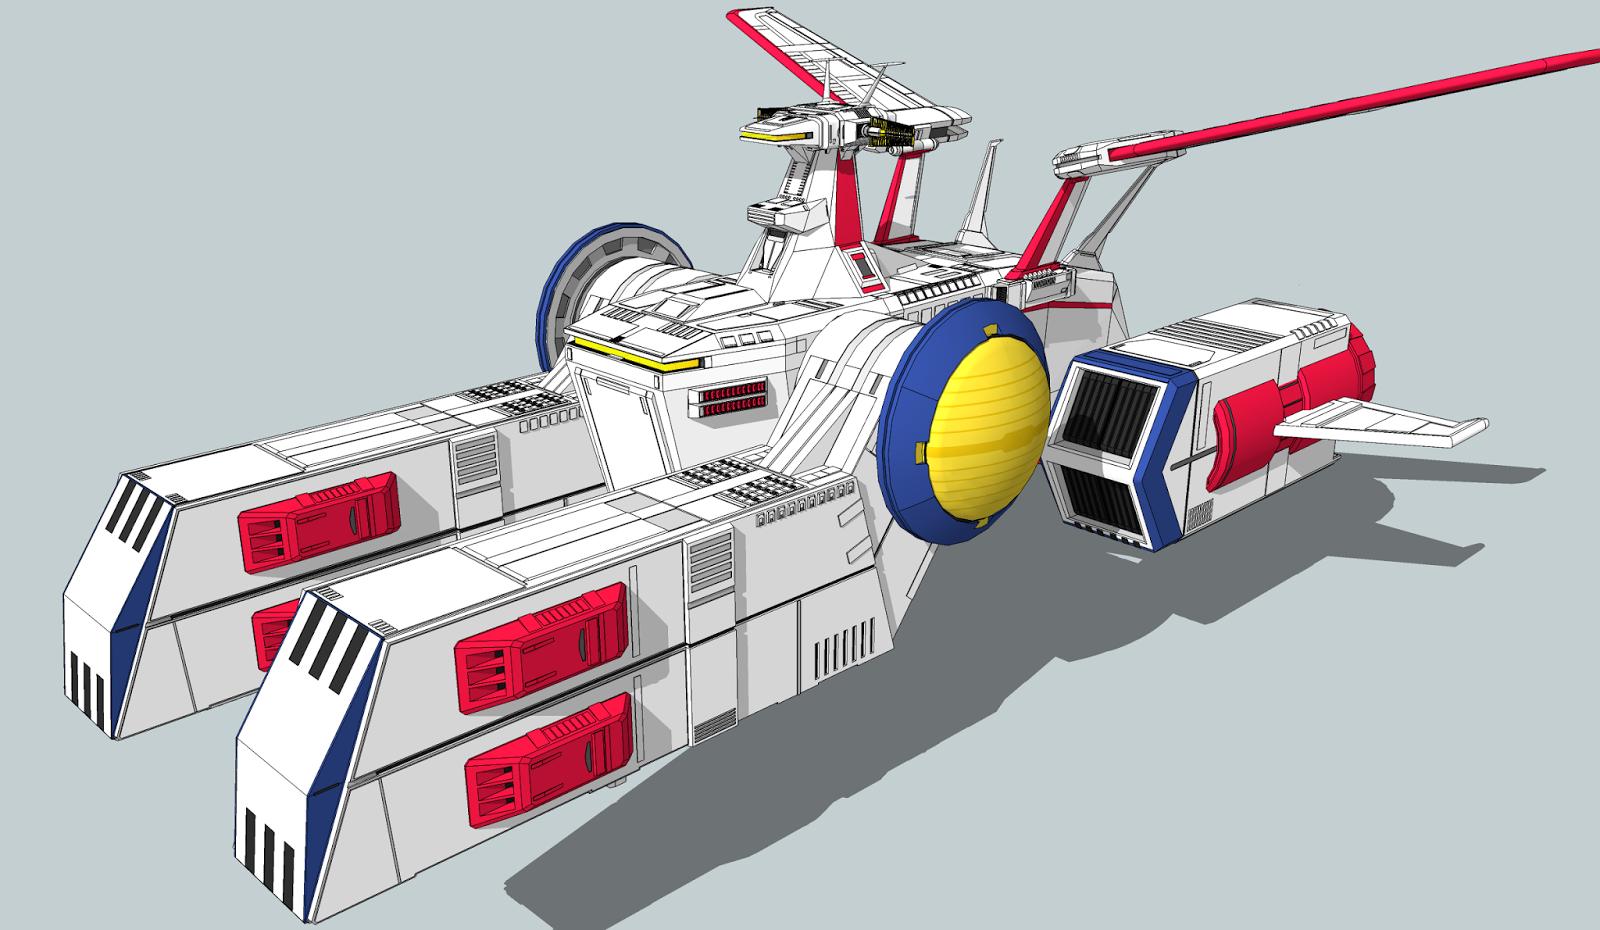 SketchUpでデジタルプラモ: ペガサス級強襲揚陸艦WHITE BASE